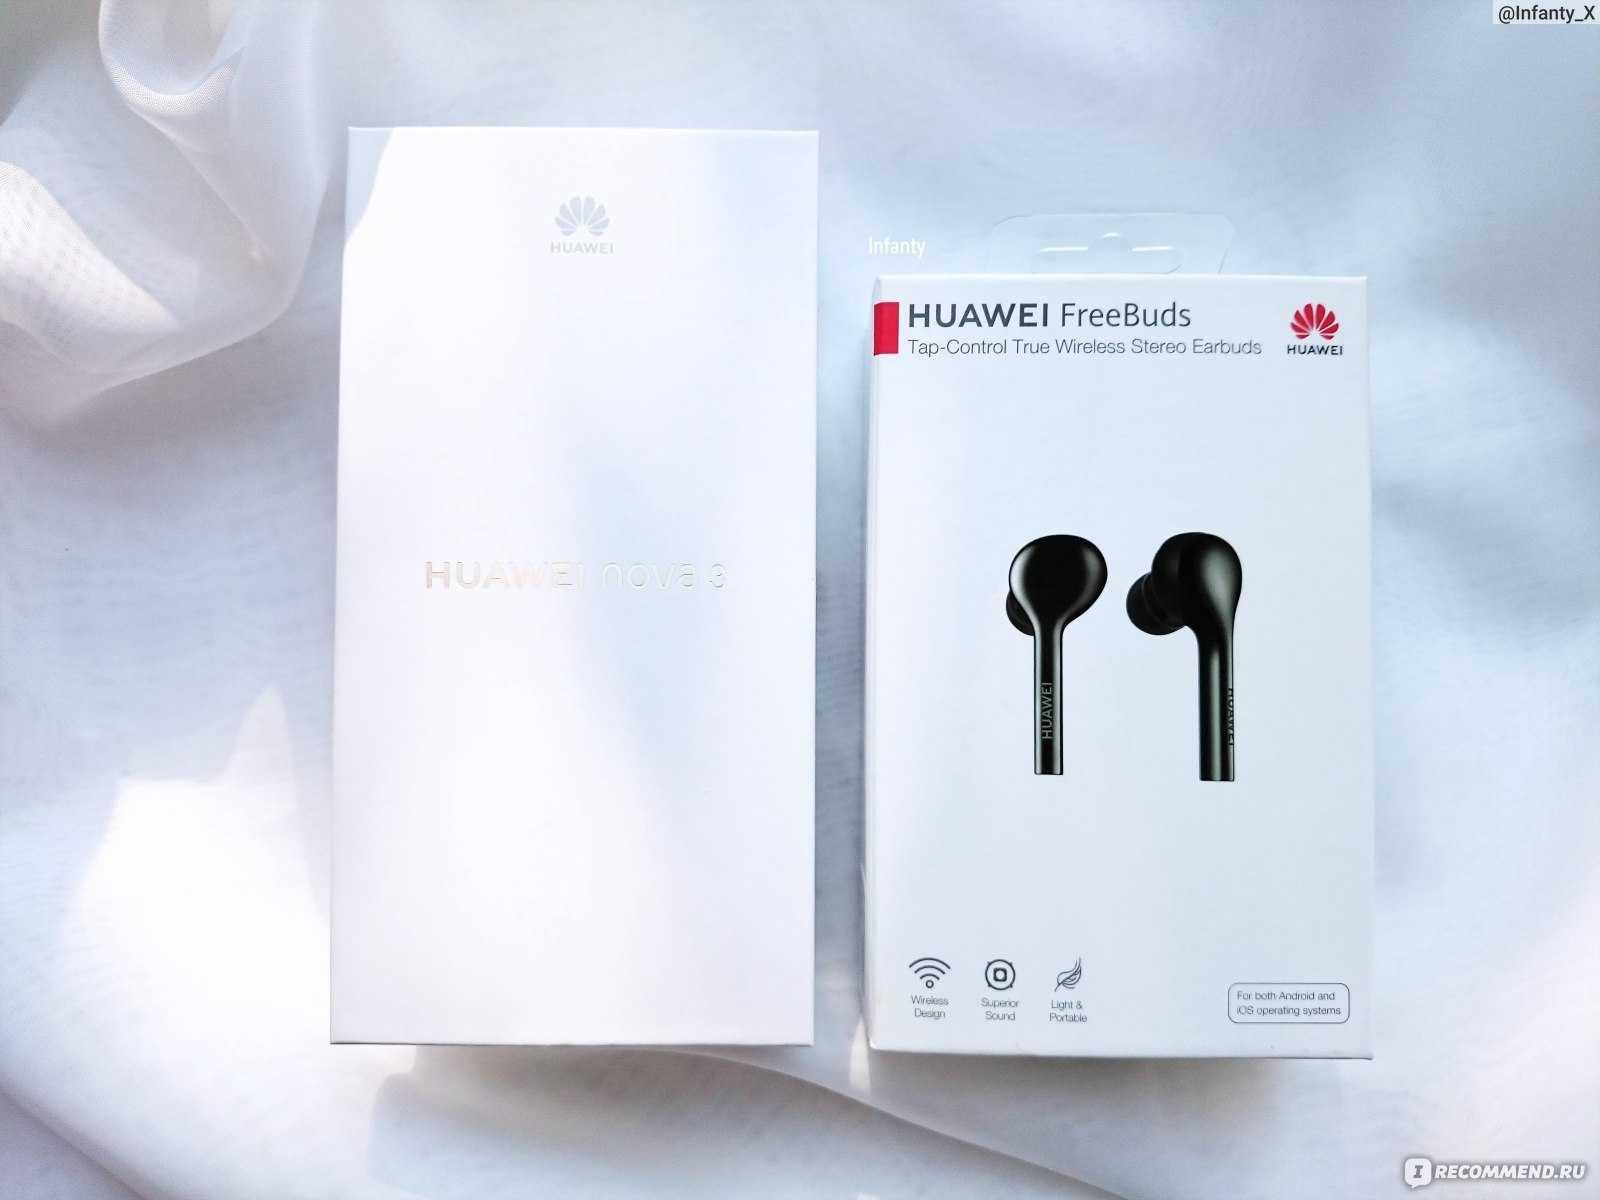 Обзор huawei freebuds 3. шумоподавление в форм-факторе airpods - rozetked.me